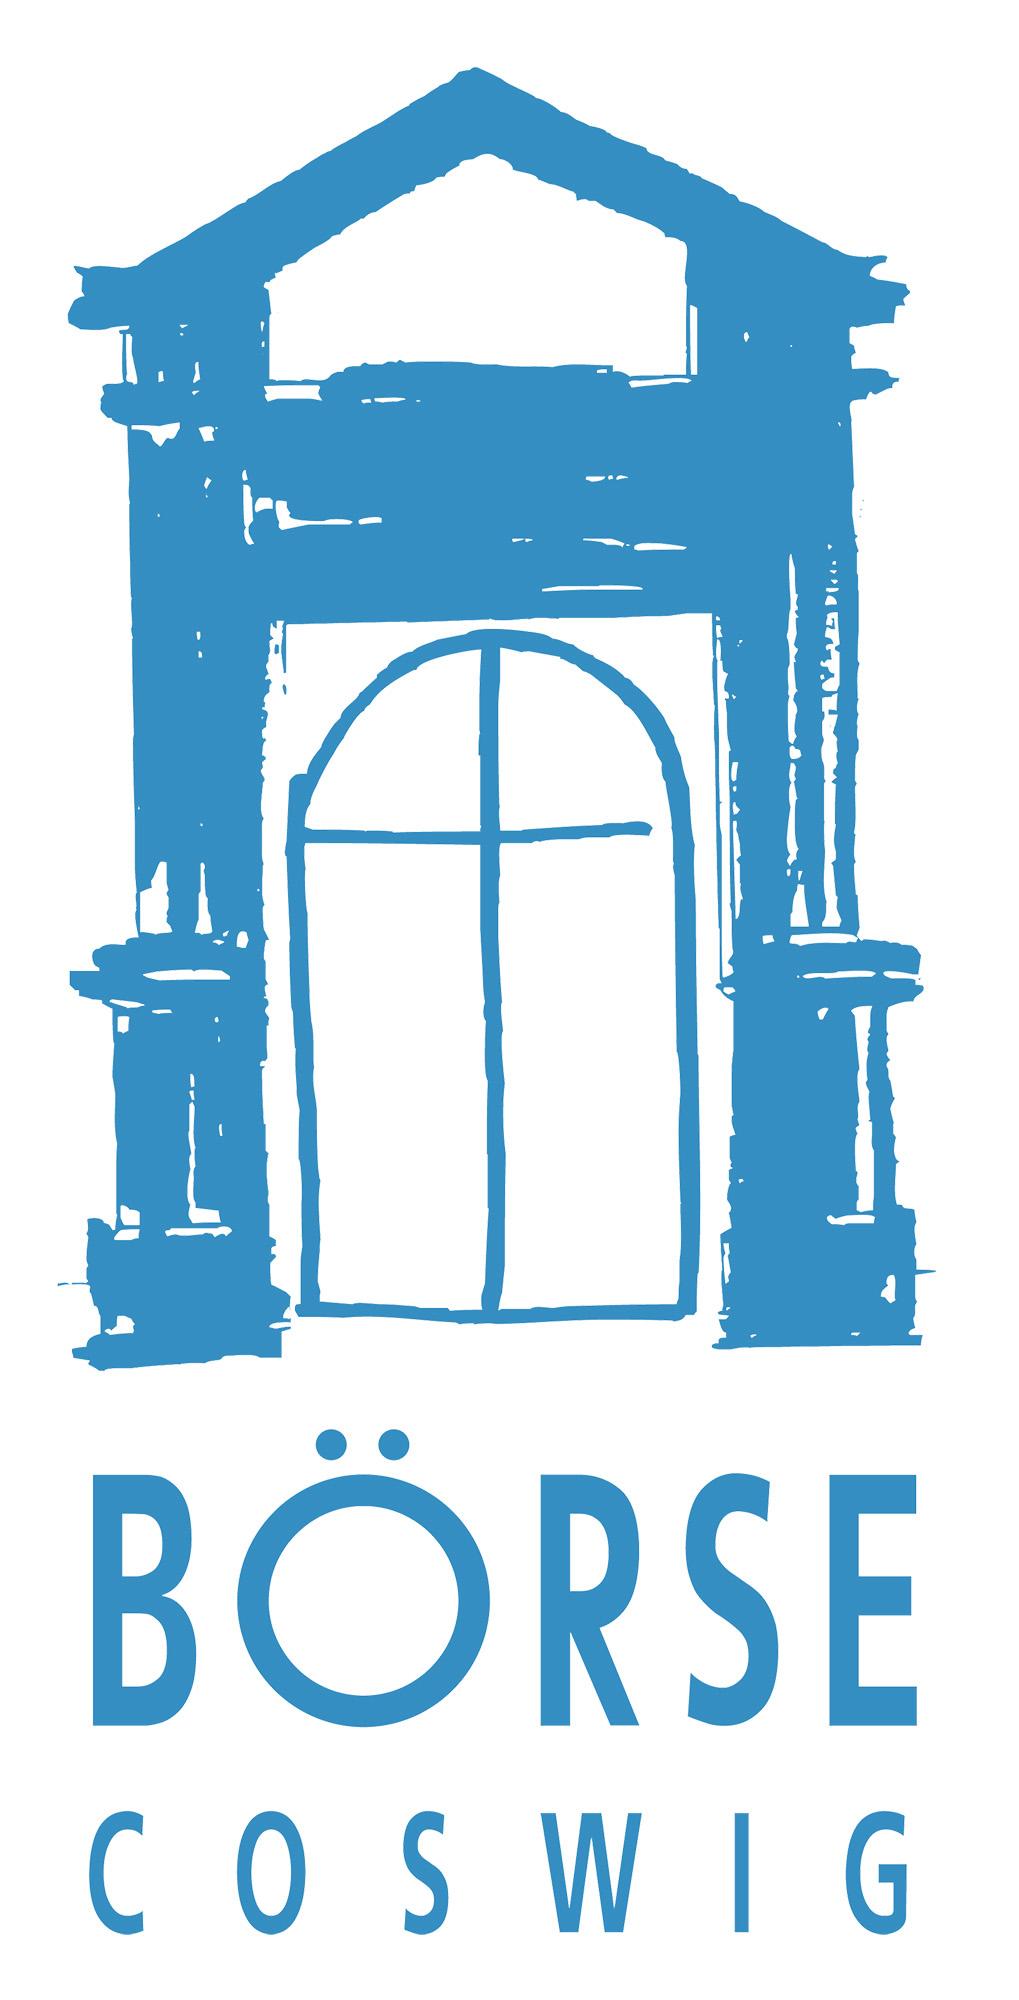 börse coswig logo